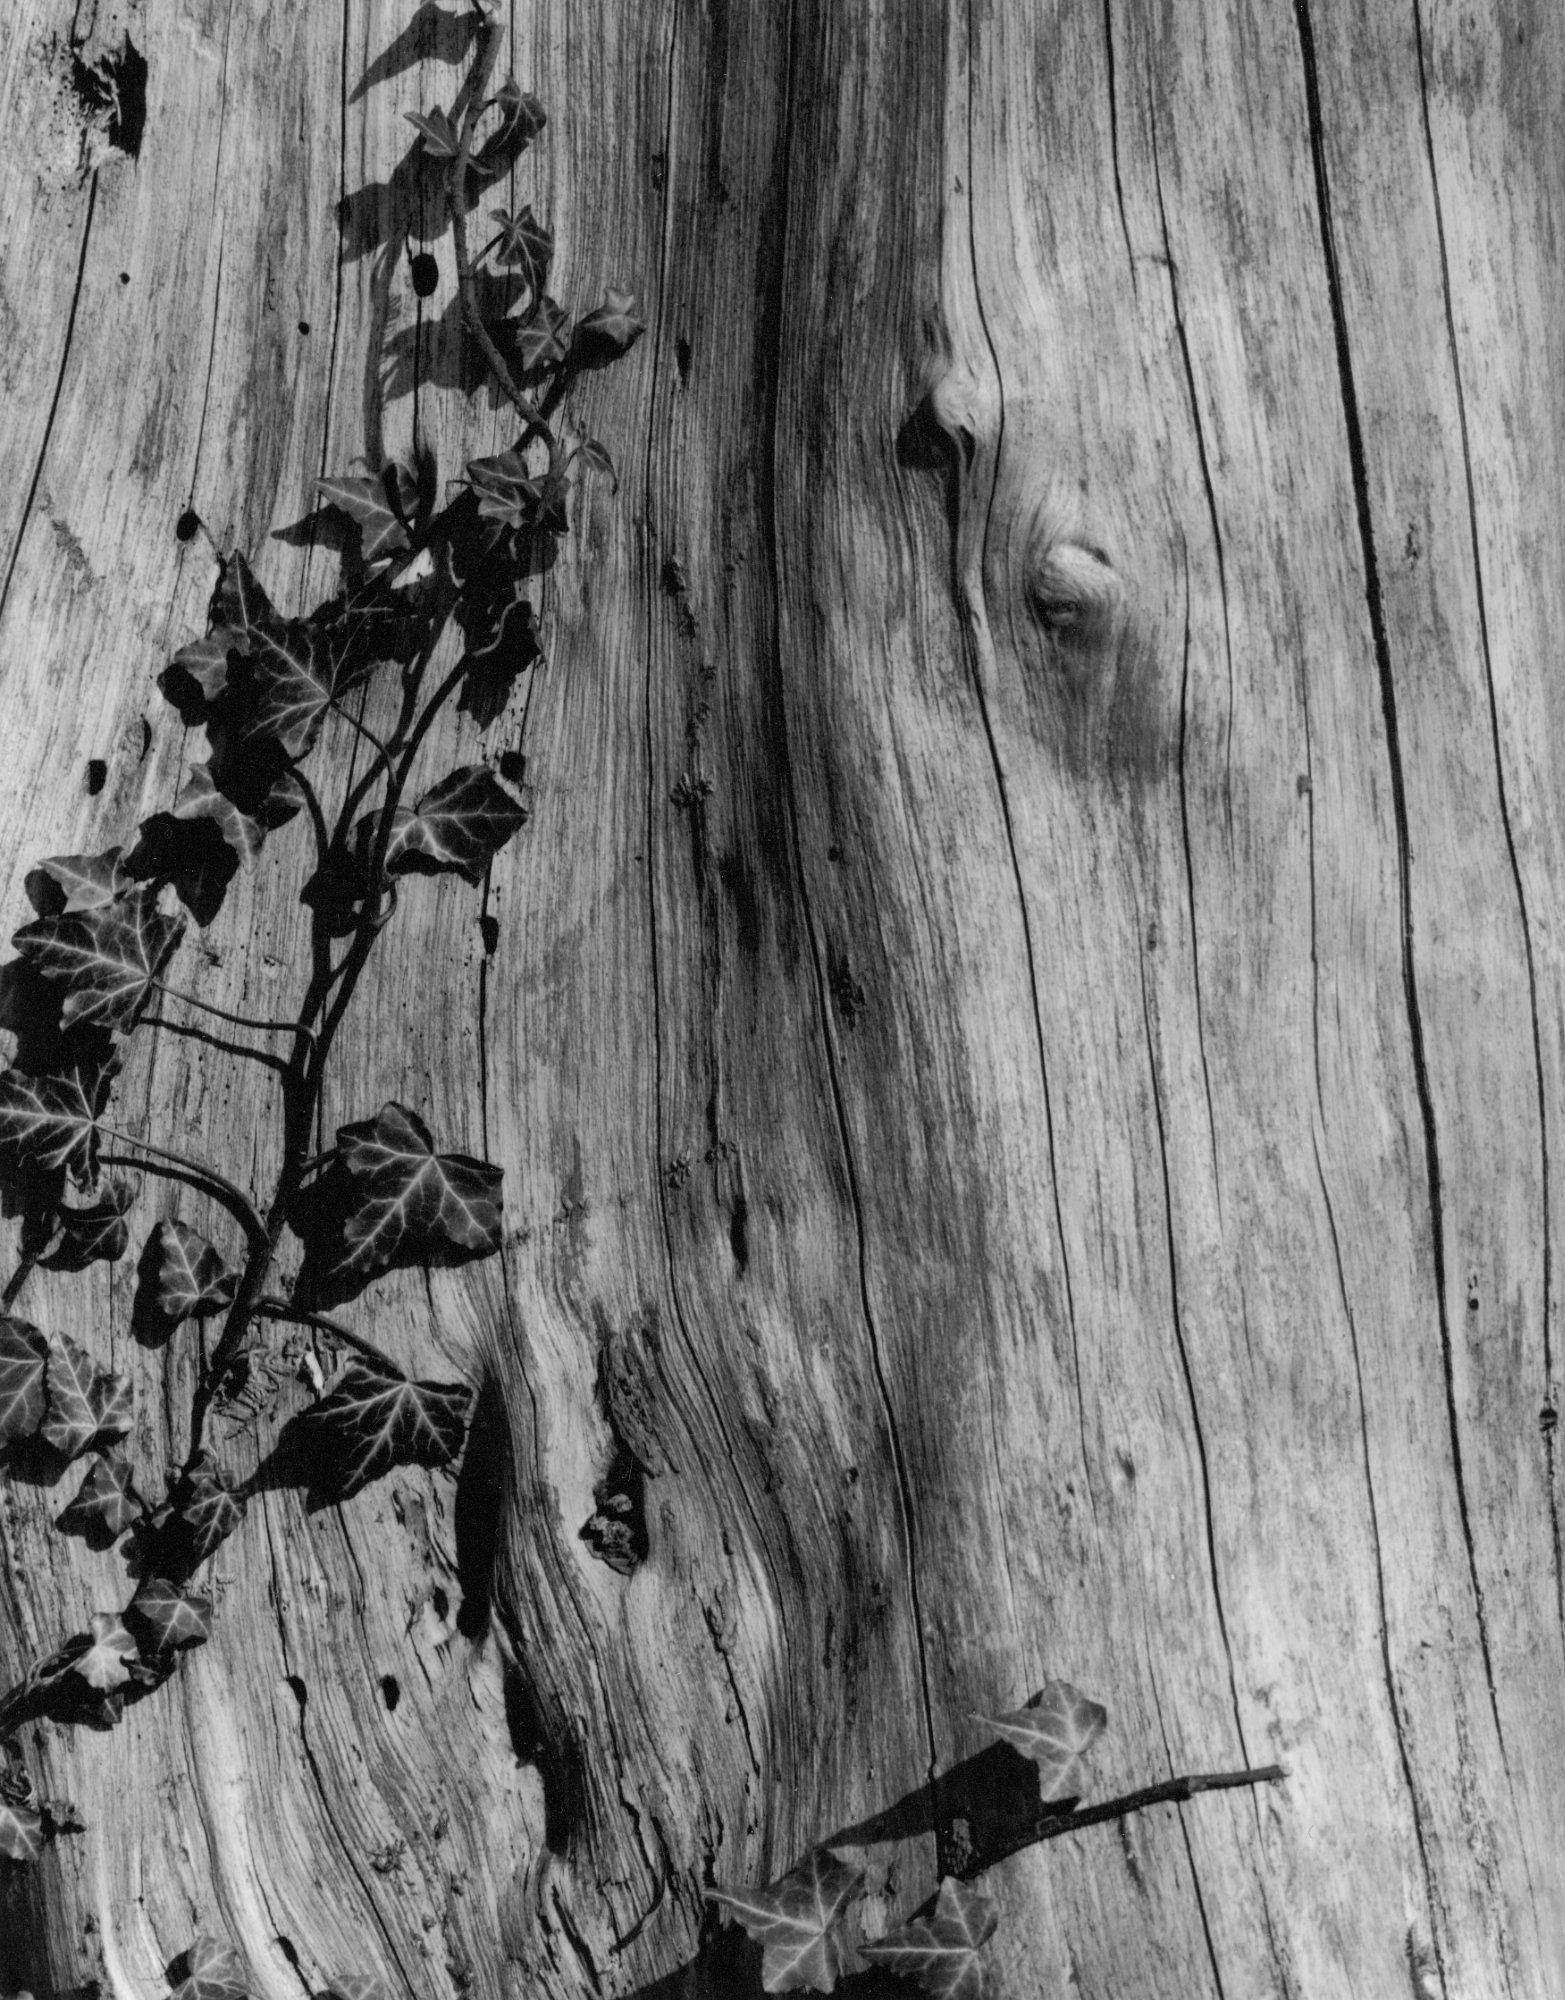 Wald - Danilo Bittorf Analog Photography